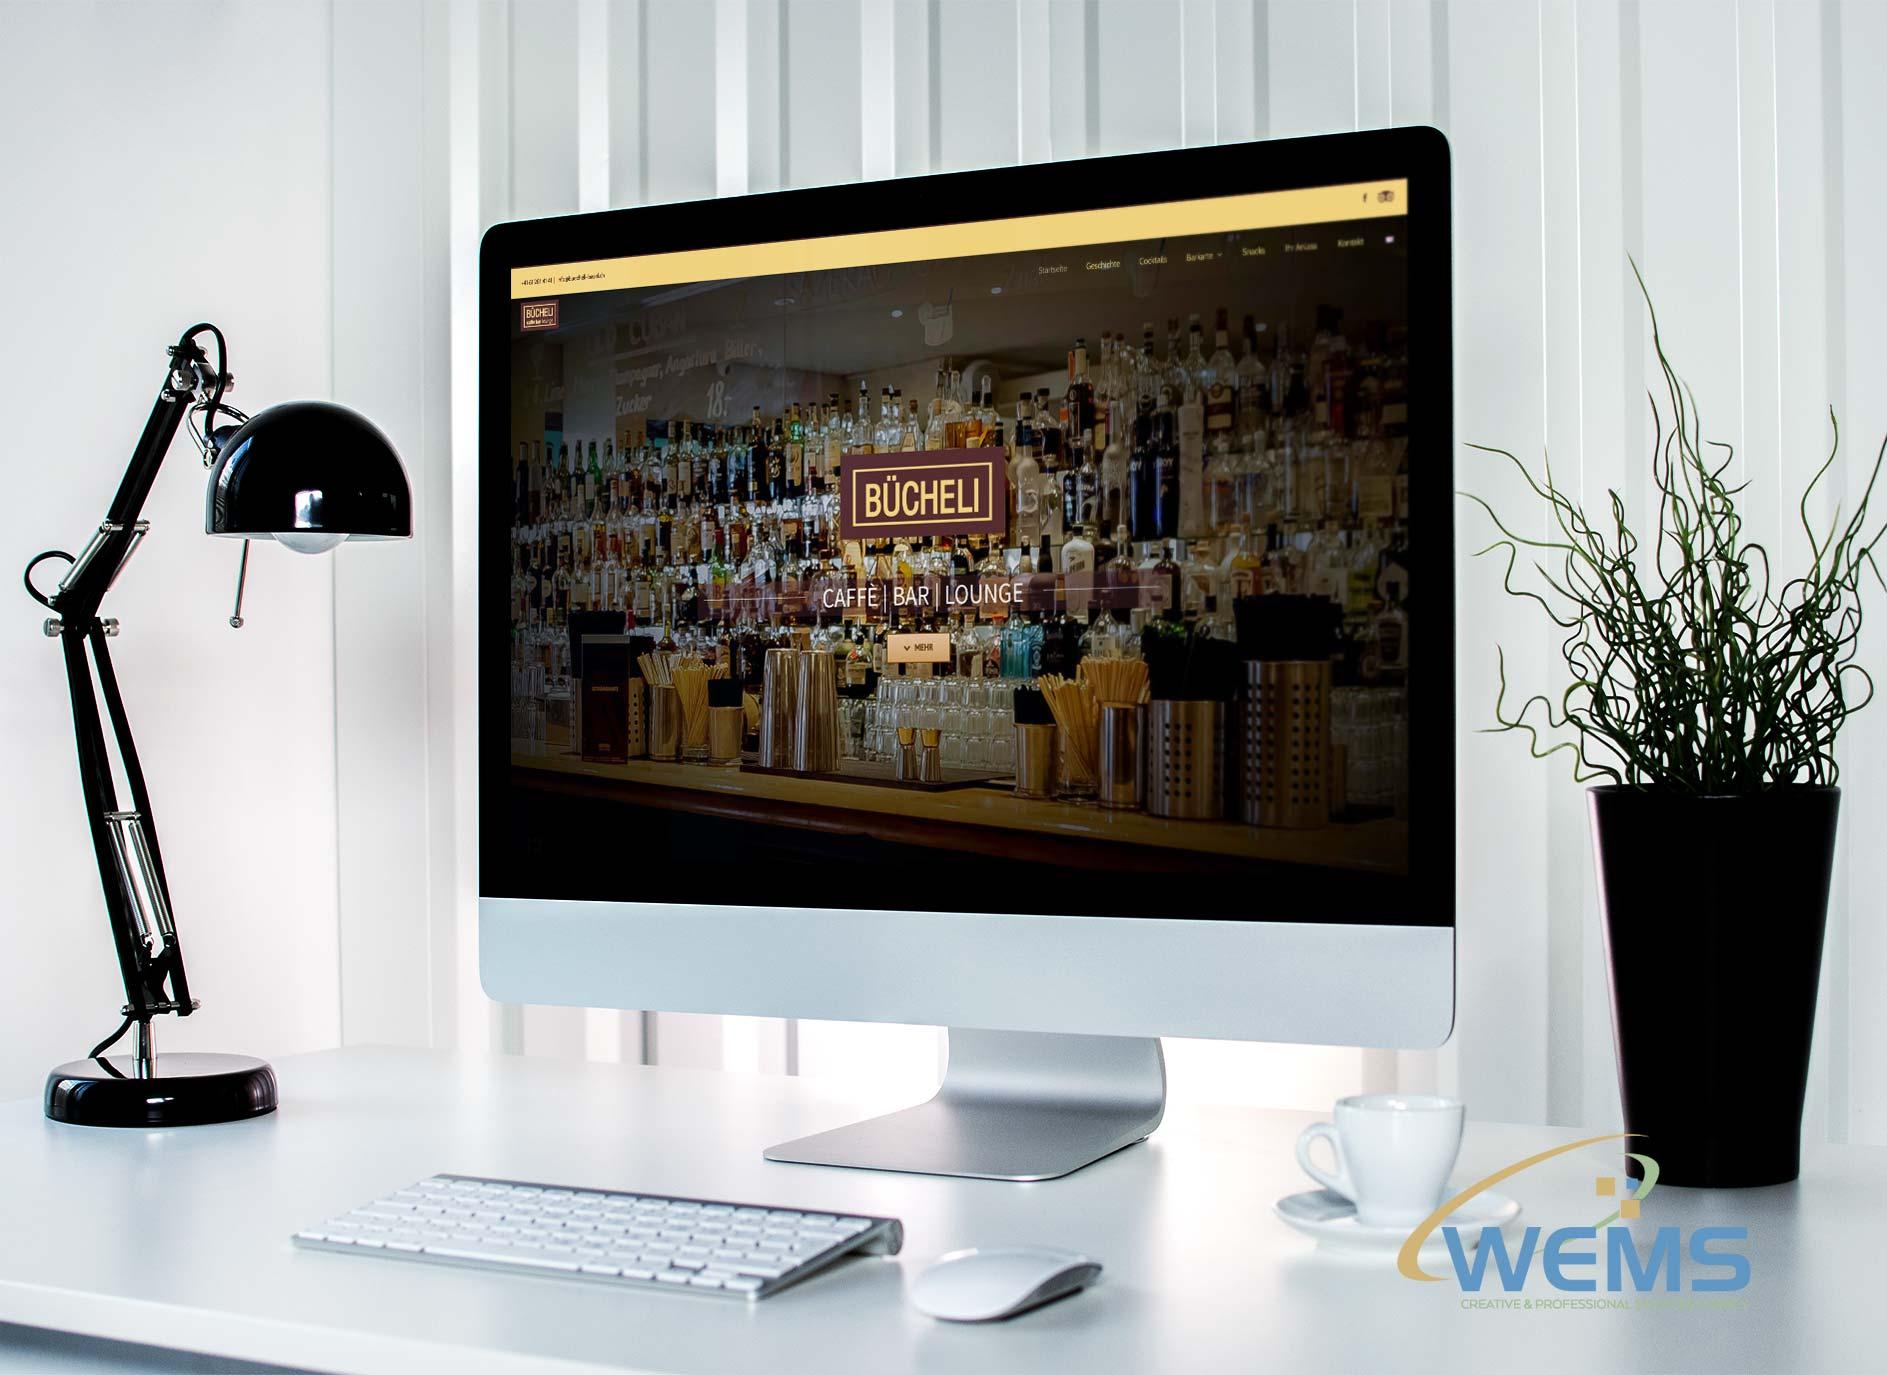 wems agency webdesign mockup bücheli basel - Webdesign und Suchmaschinenoptimierung (SEO) Agentur